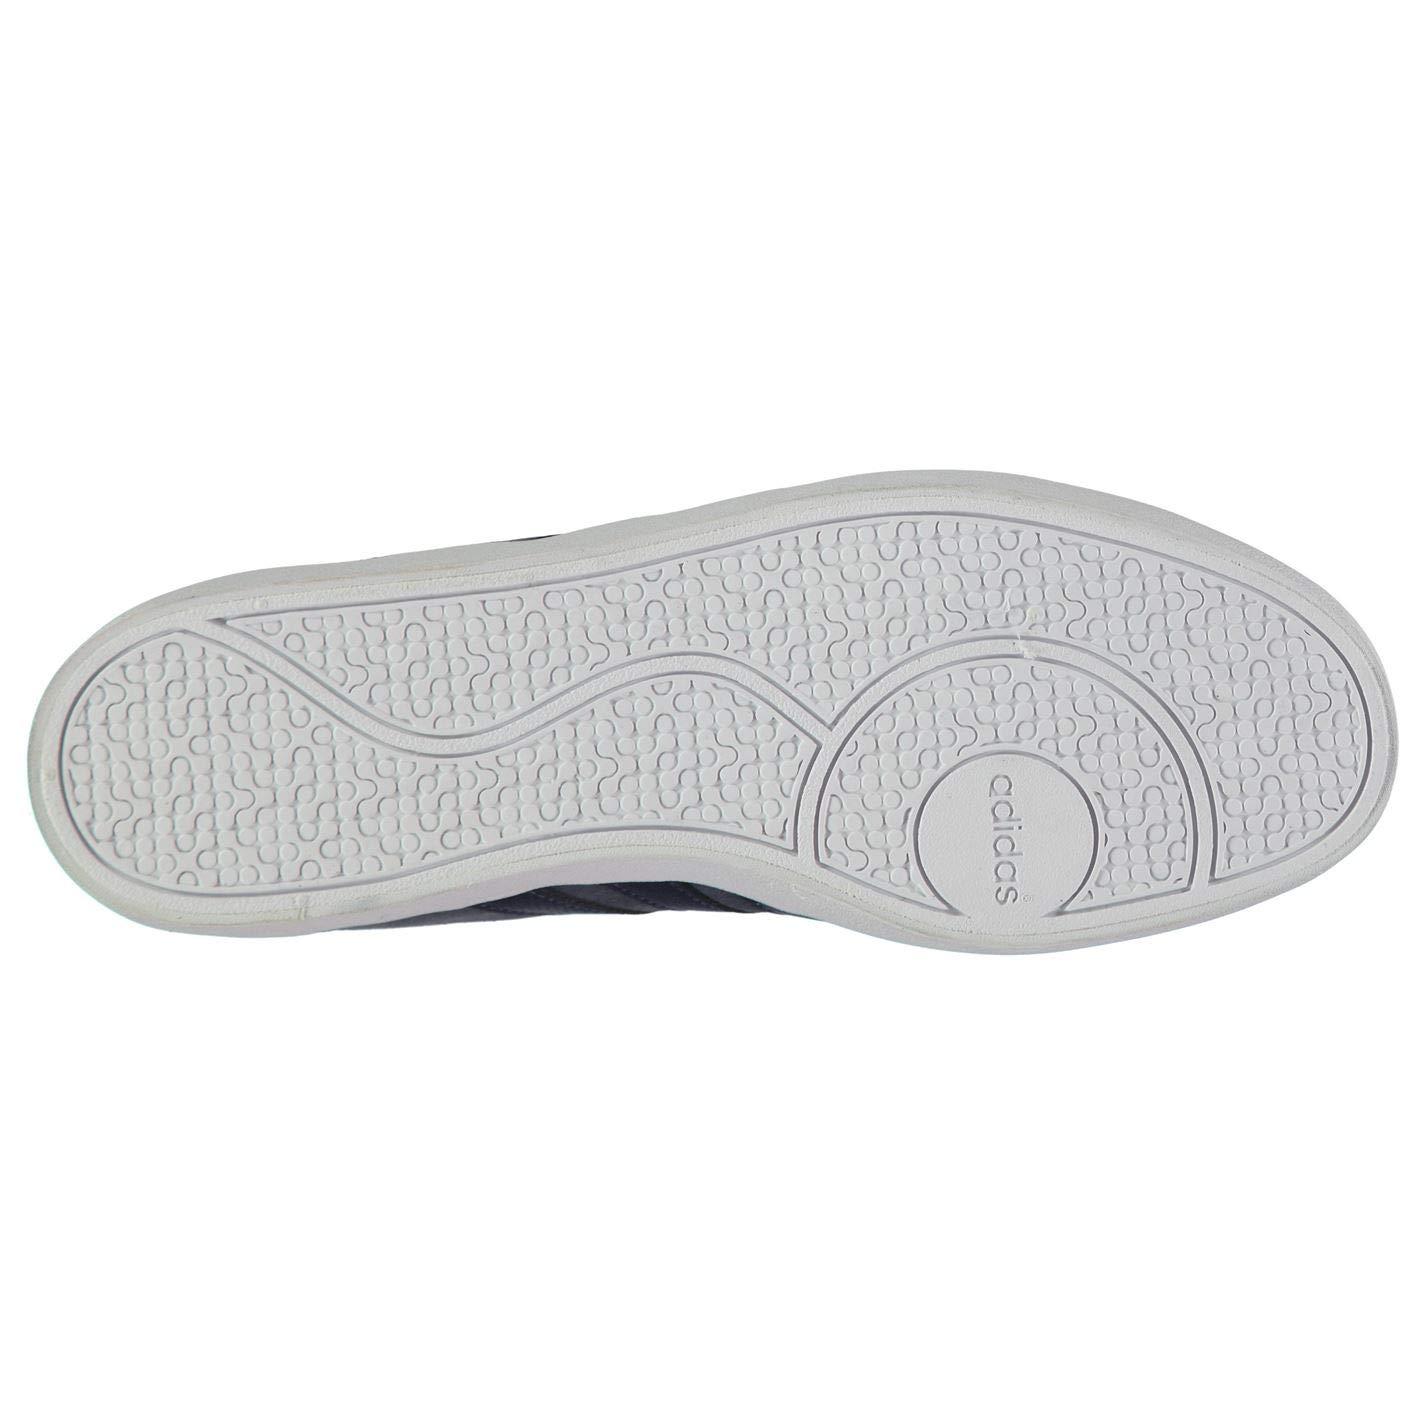 Adidas Herren Court Vulc Vulc Vulc Low-top, rot 018dfc